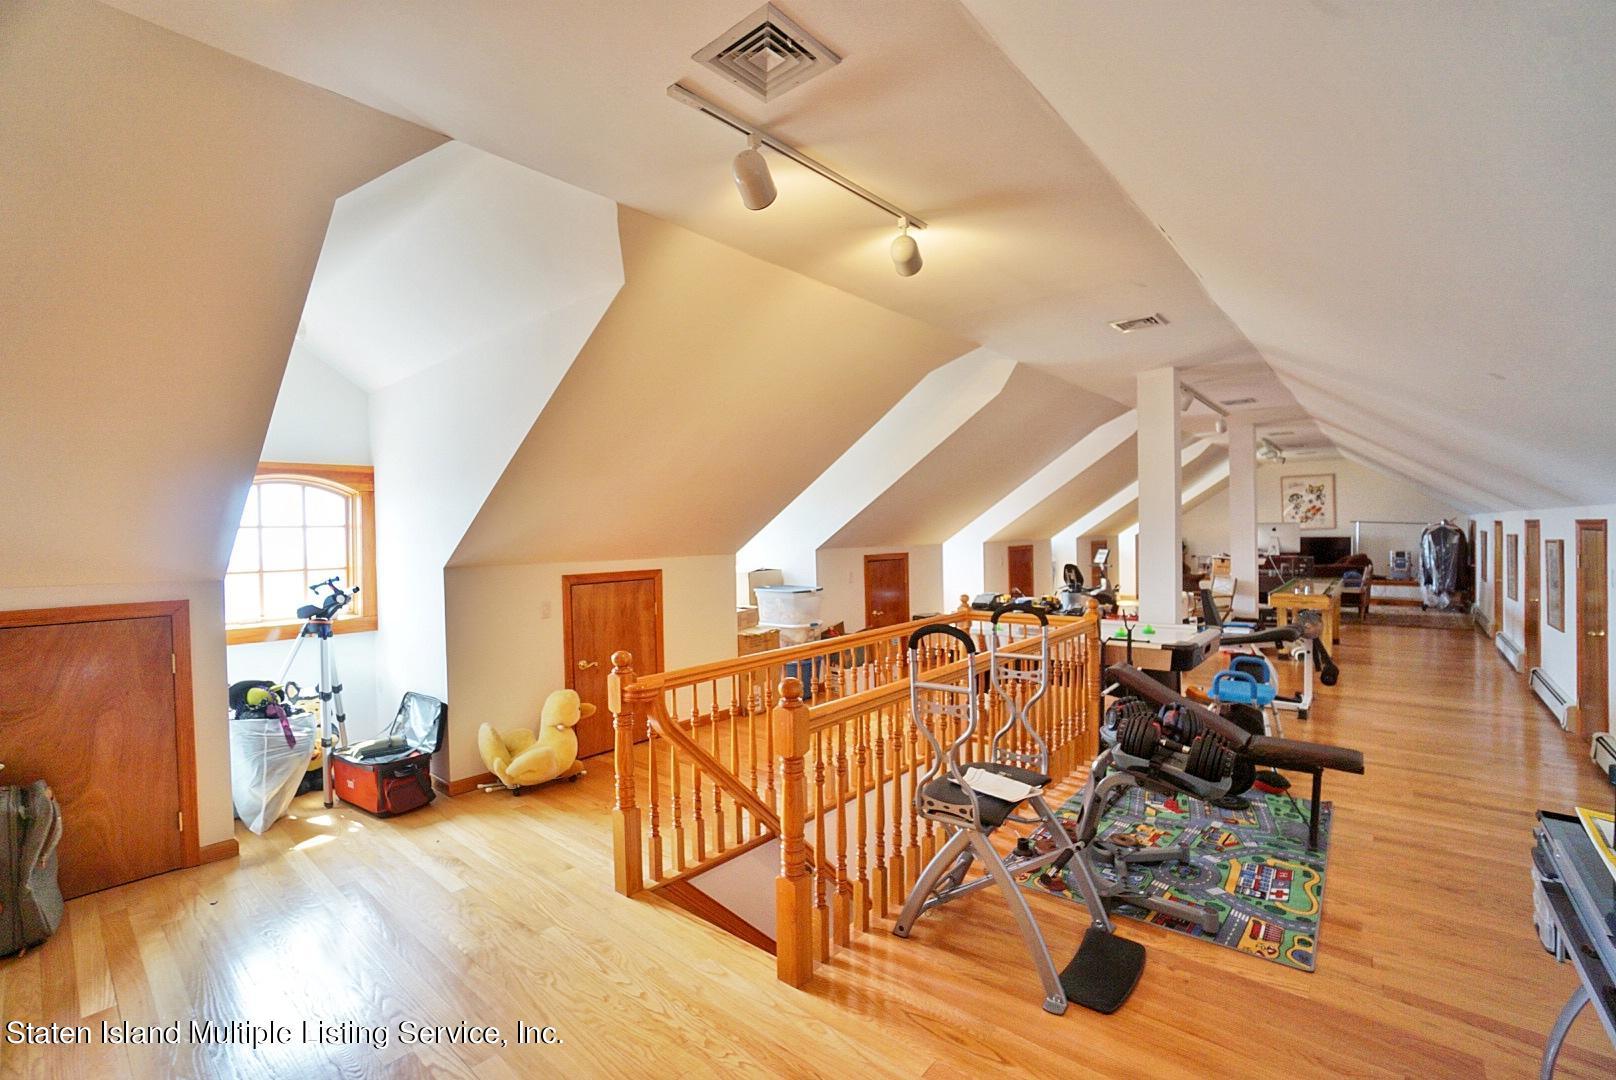 Single Family - Detached 129 Coverly Avenue   Staten Island, NY 10301, MLS-1144490-44